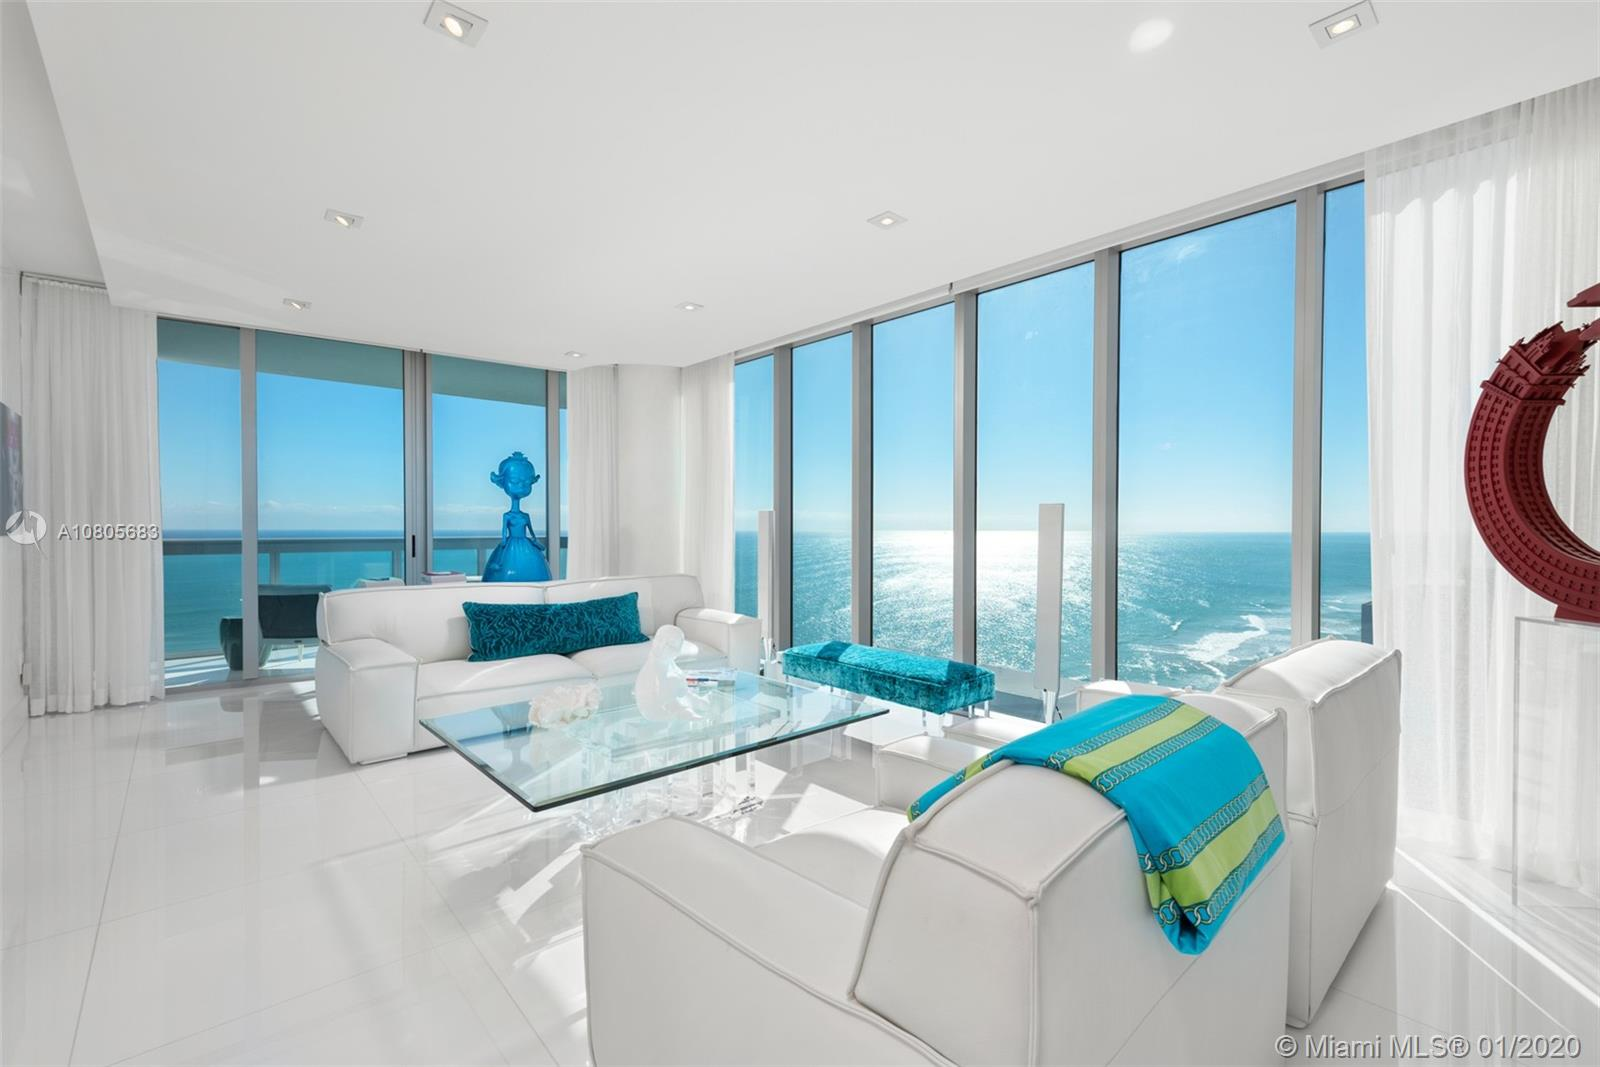 6899 Collins Ave, 2308 - Miami Beach, Florida